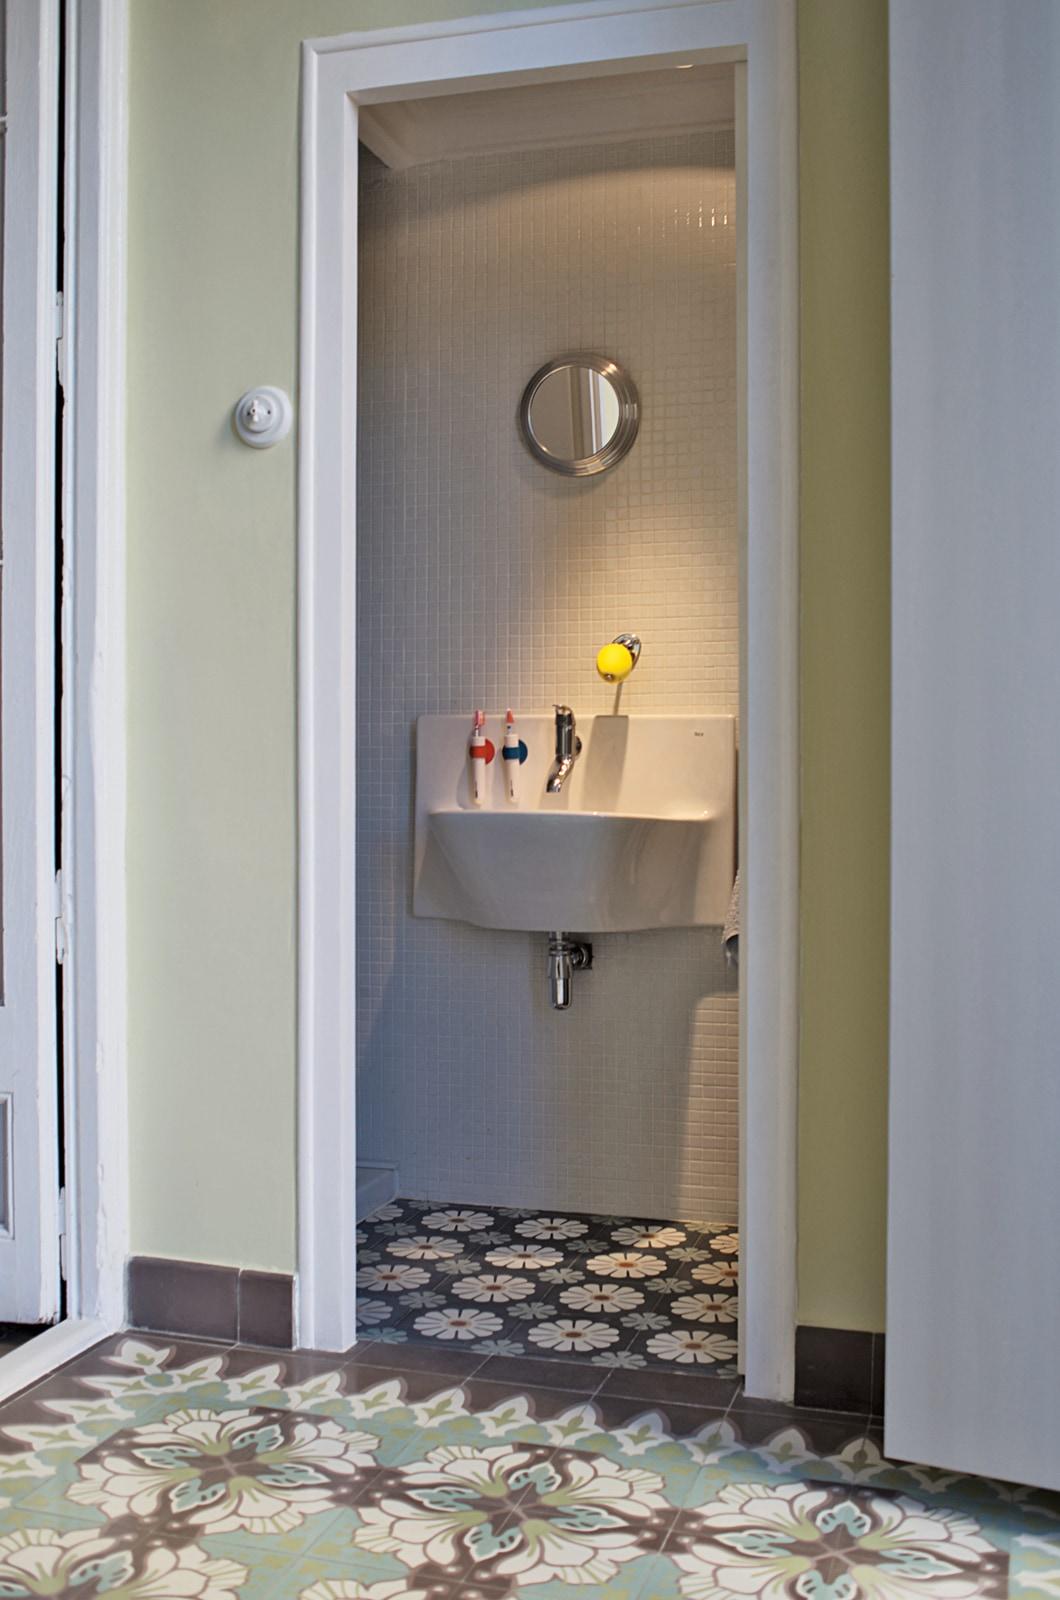 zementmosaikplatten-13744-gaeste-wc-viaplatten | 13744